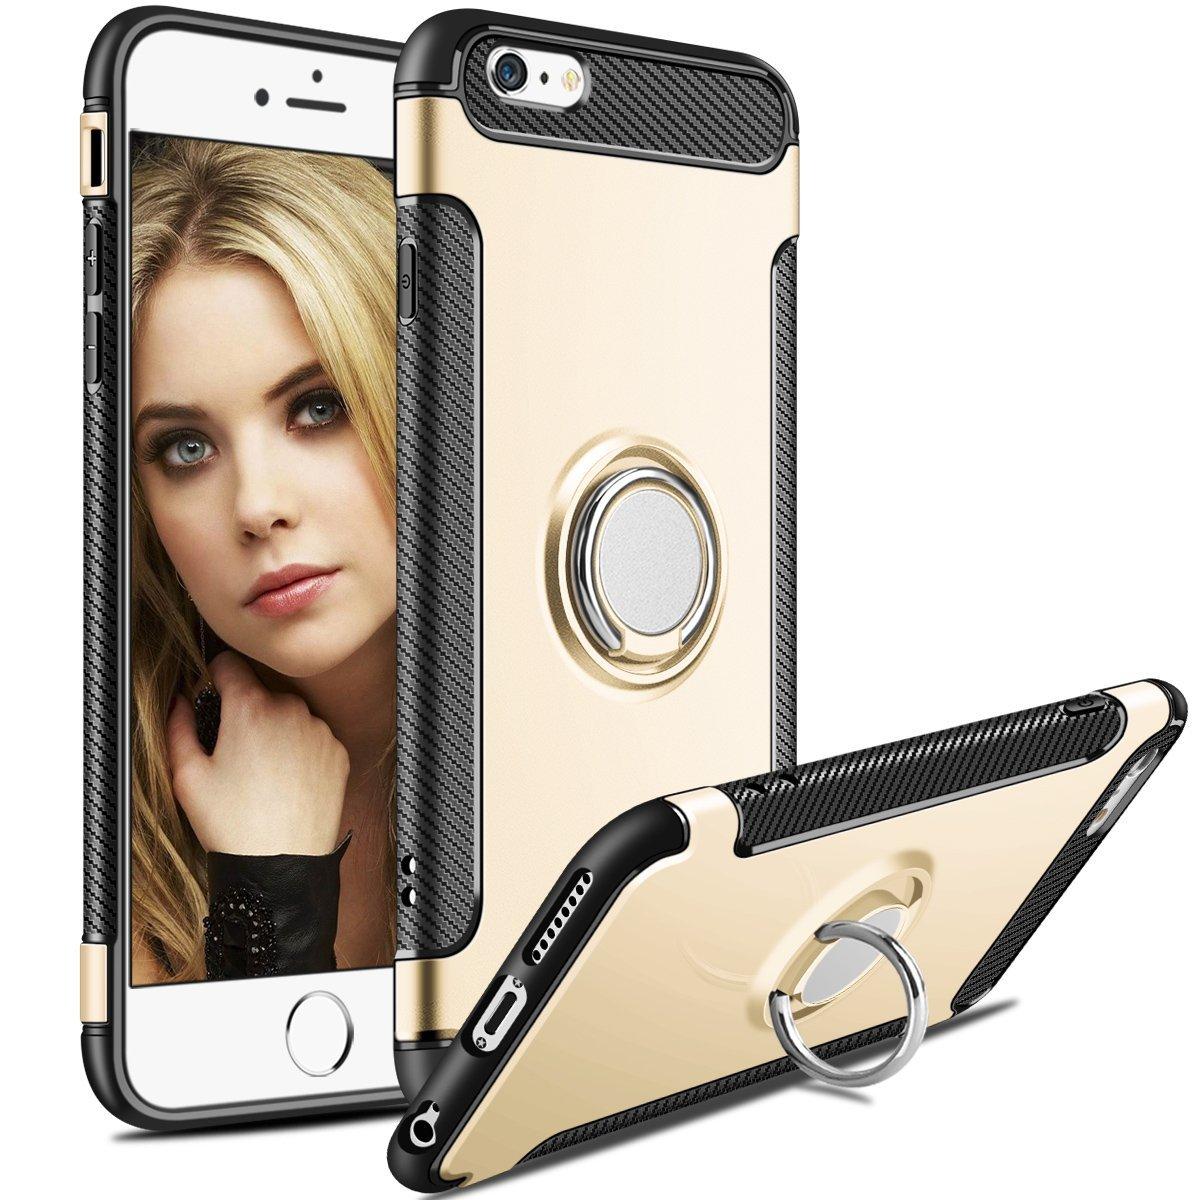 Pouzdro iMore Magneto na Apple iPhone 6s/6 - zlatý